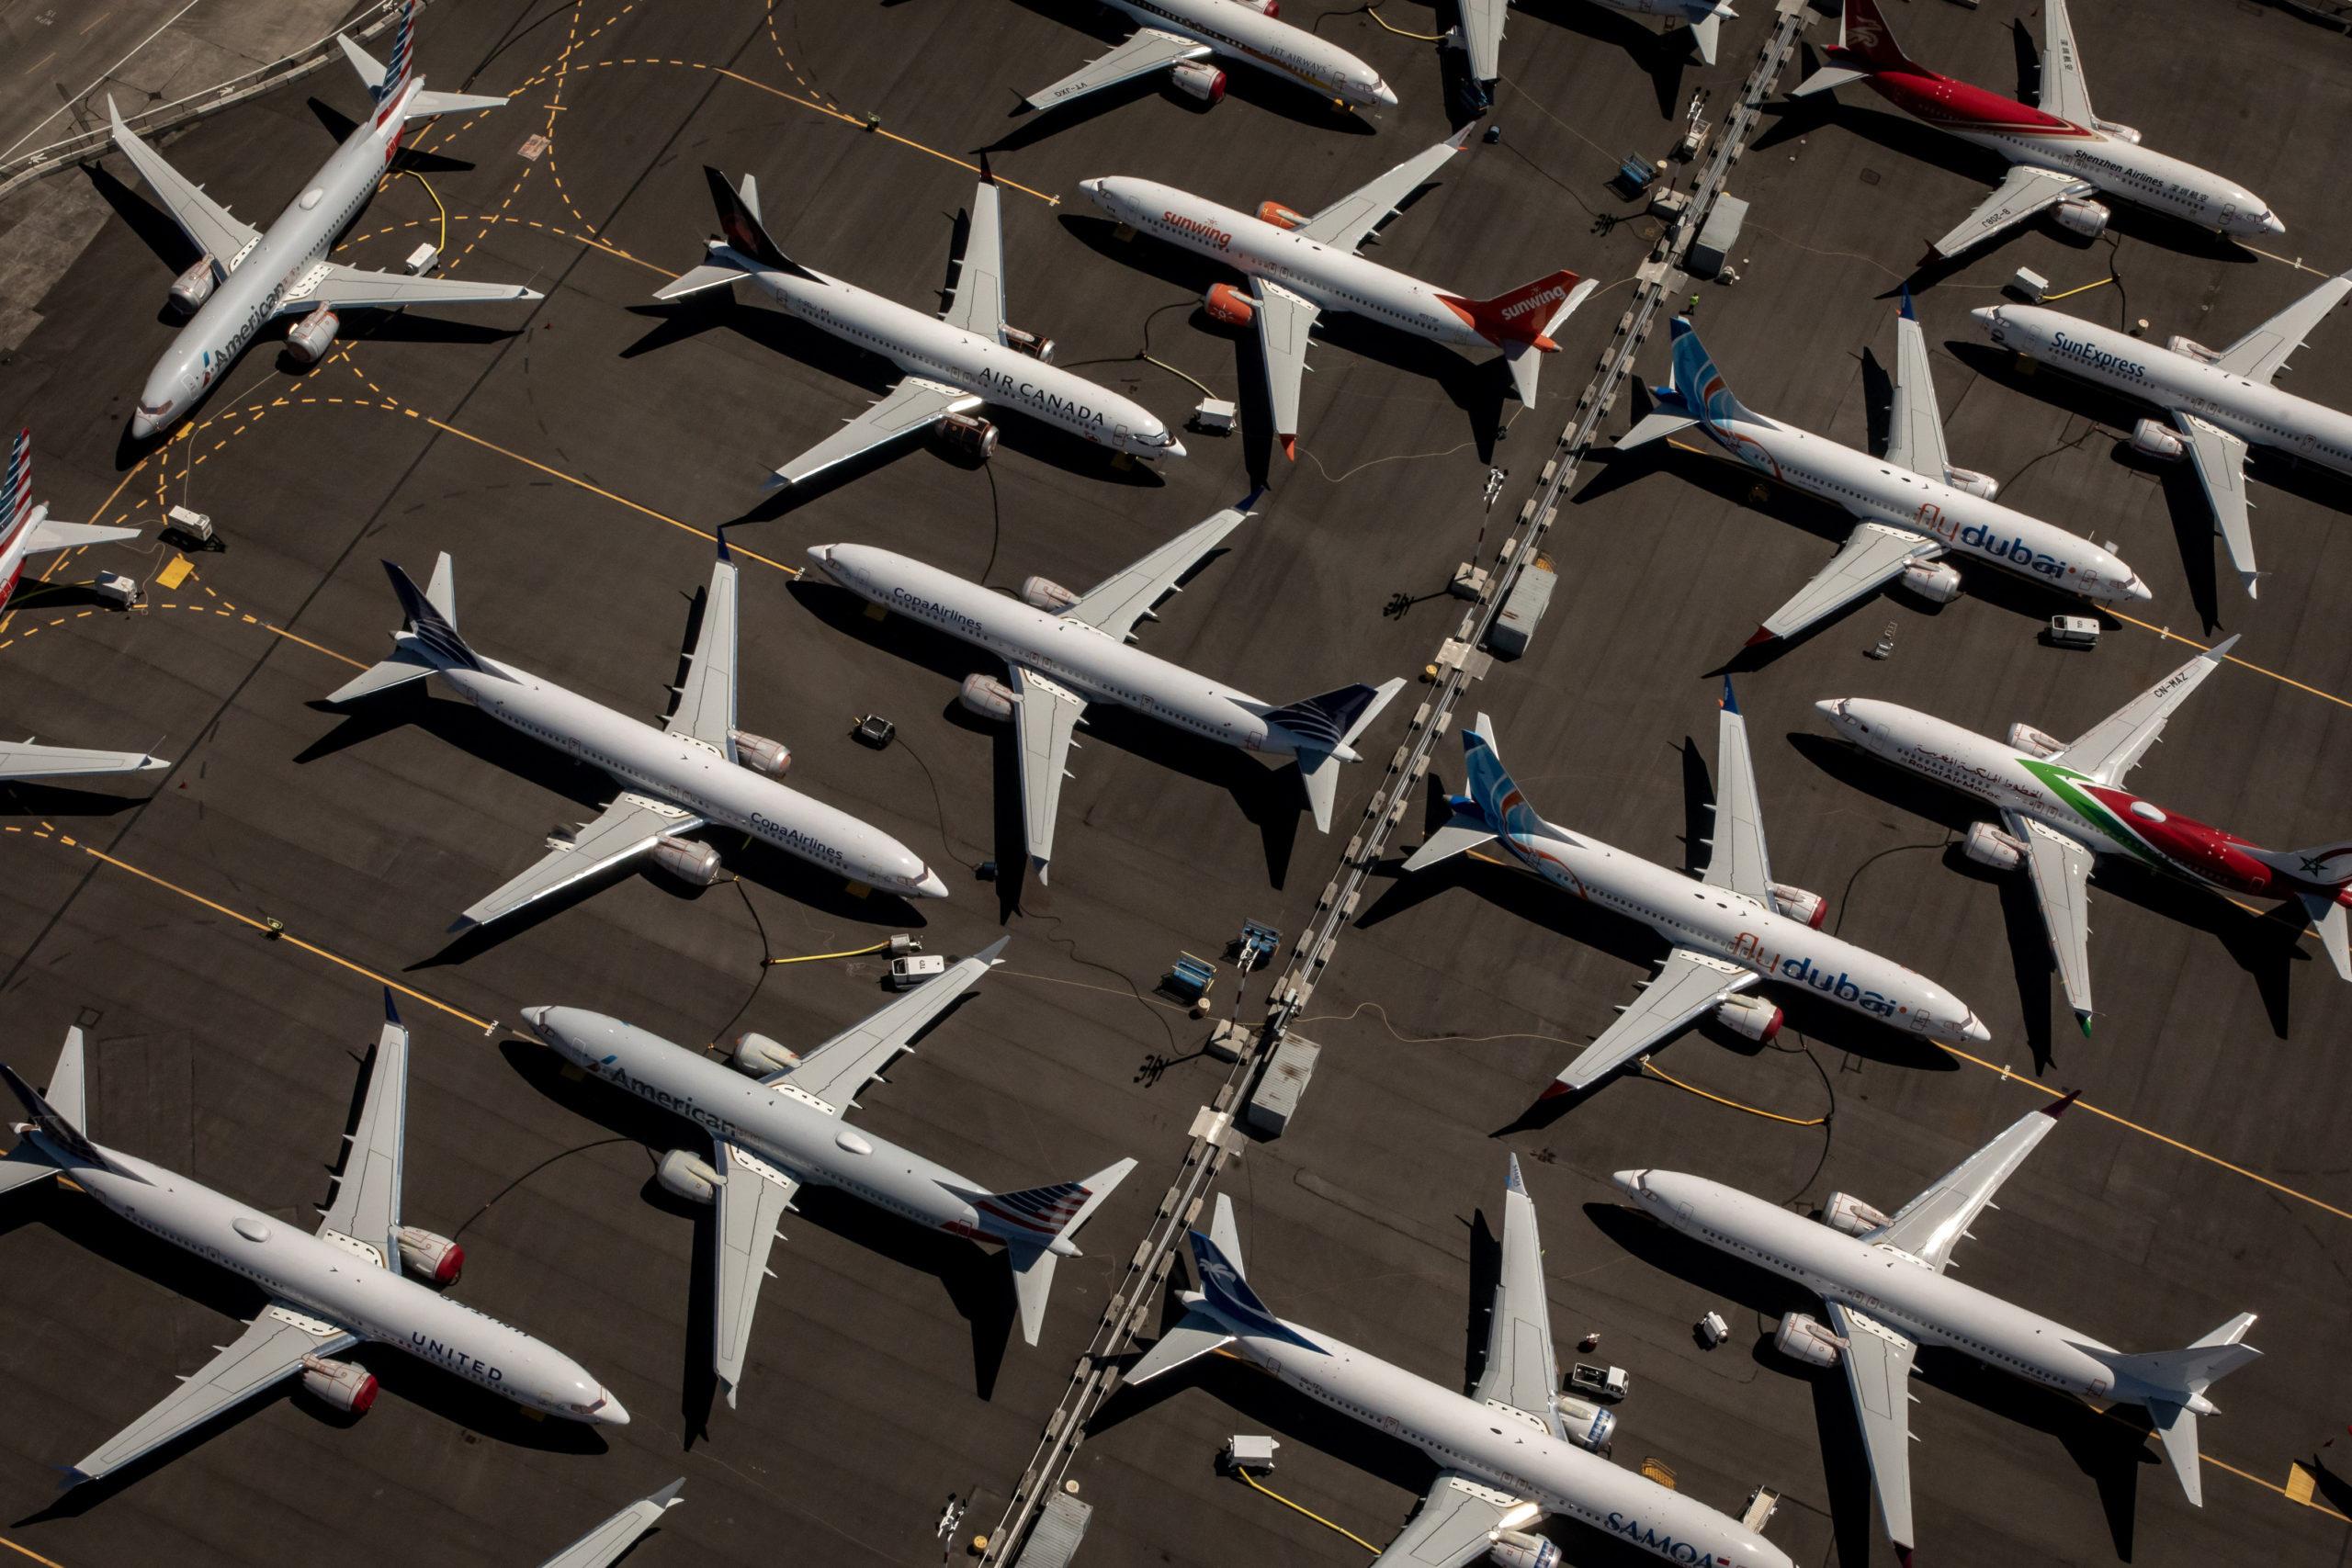 Vidéo : Boeing vs Airbus